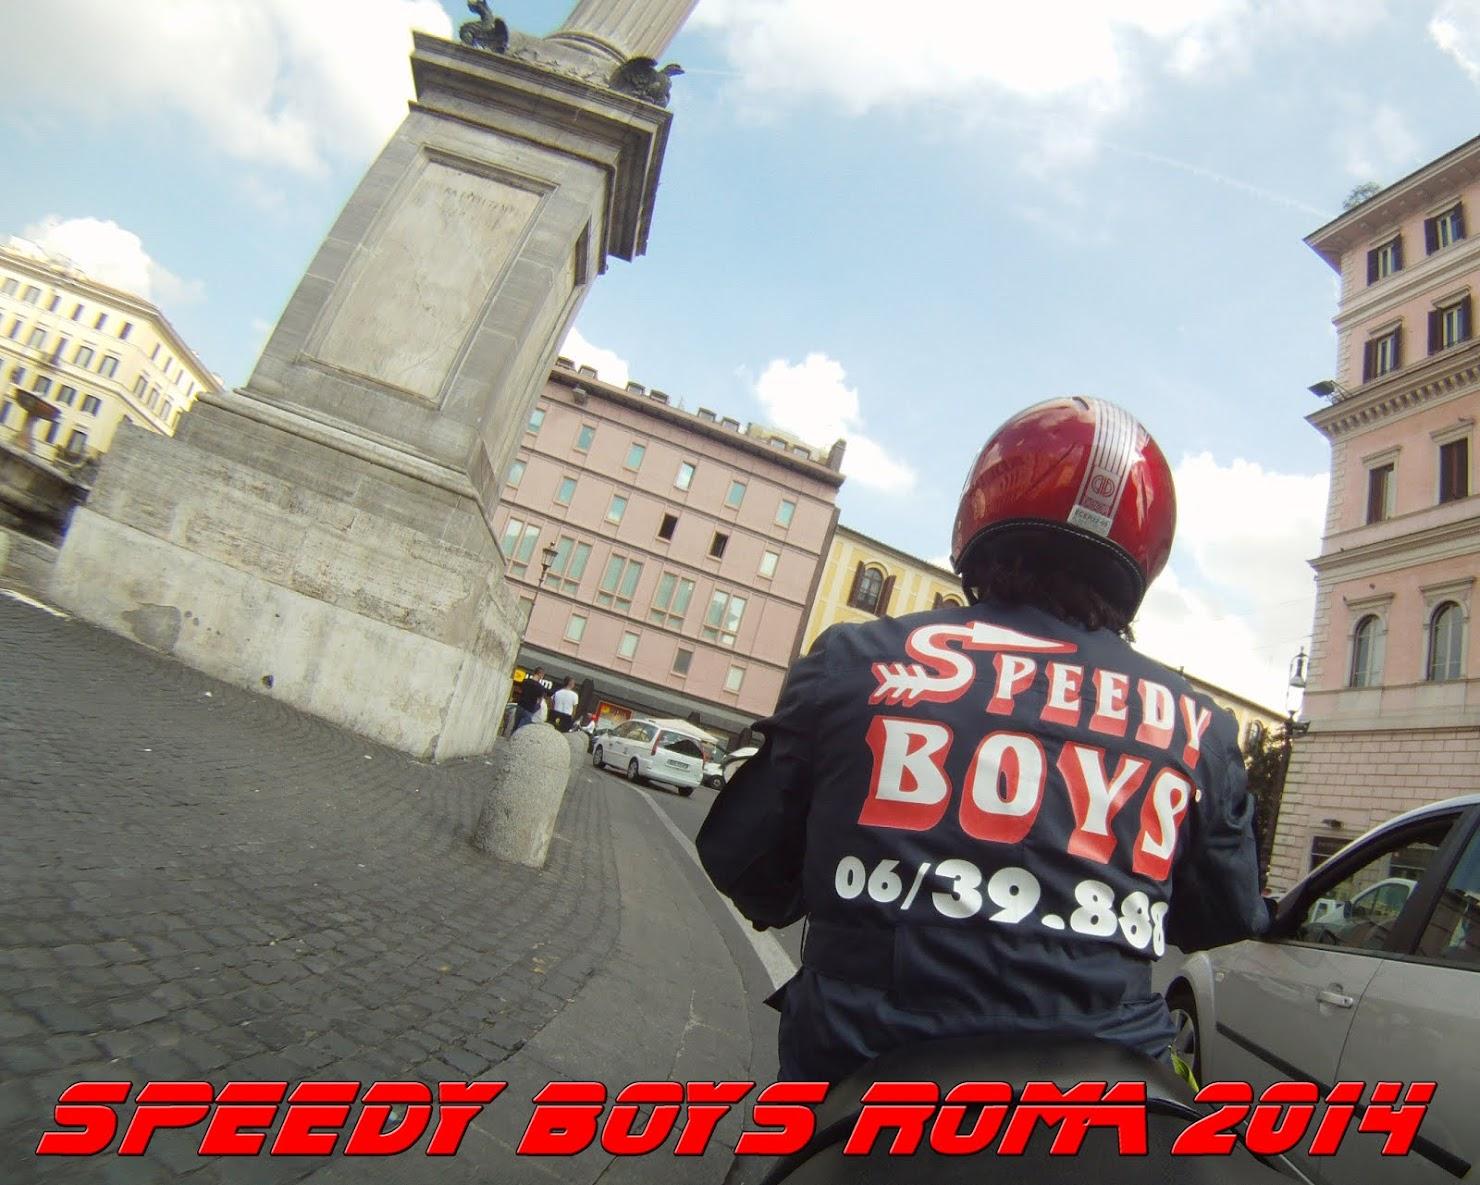 [ CONSEGNA PACCO URGENTE A ROMA ] CON [ SPEEDY BOYS ] 0639888, PONY EXPRESS CONSEGNA